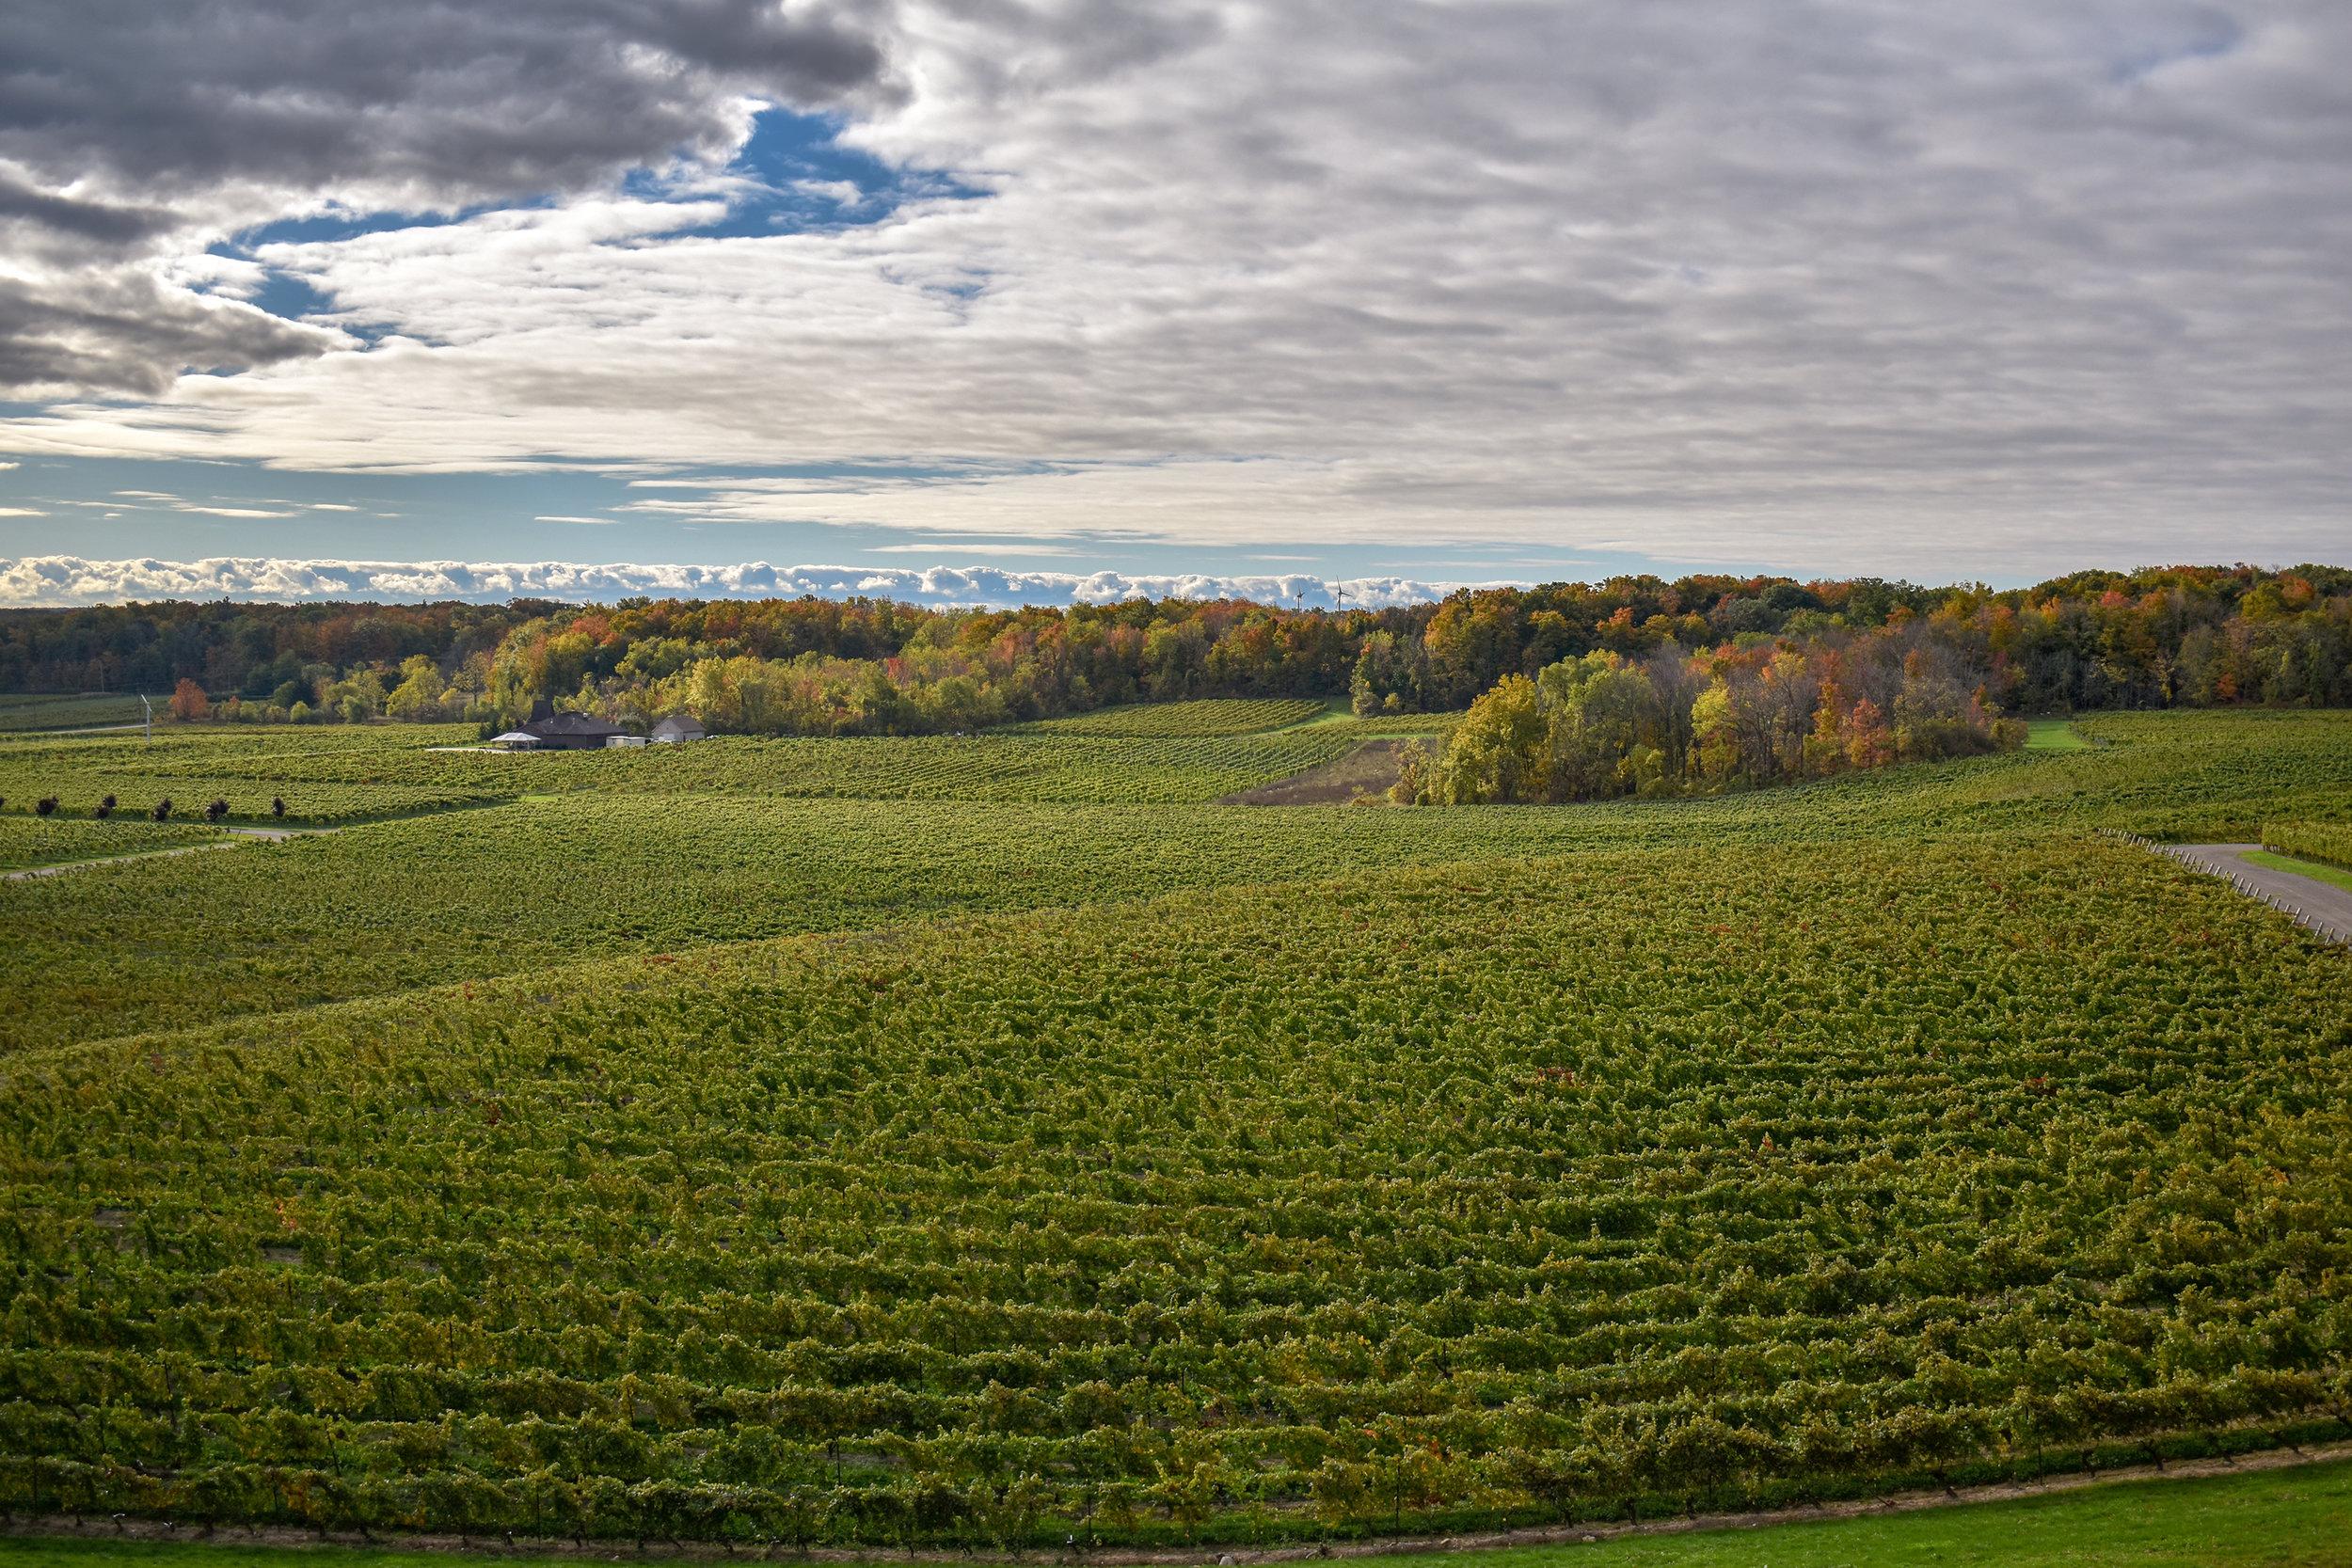 Vineyard - Vineland-LZ.jpg